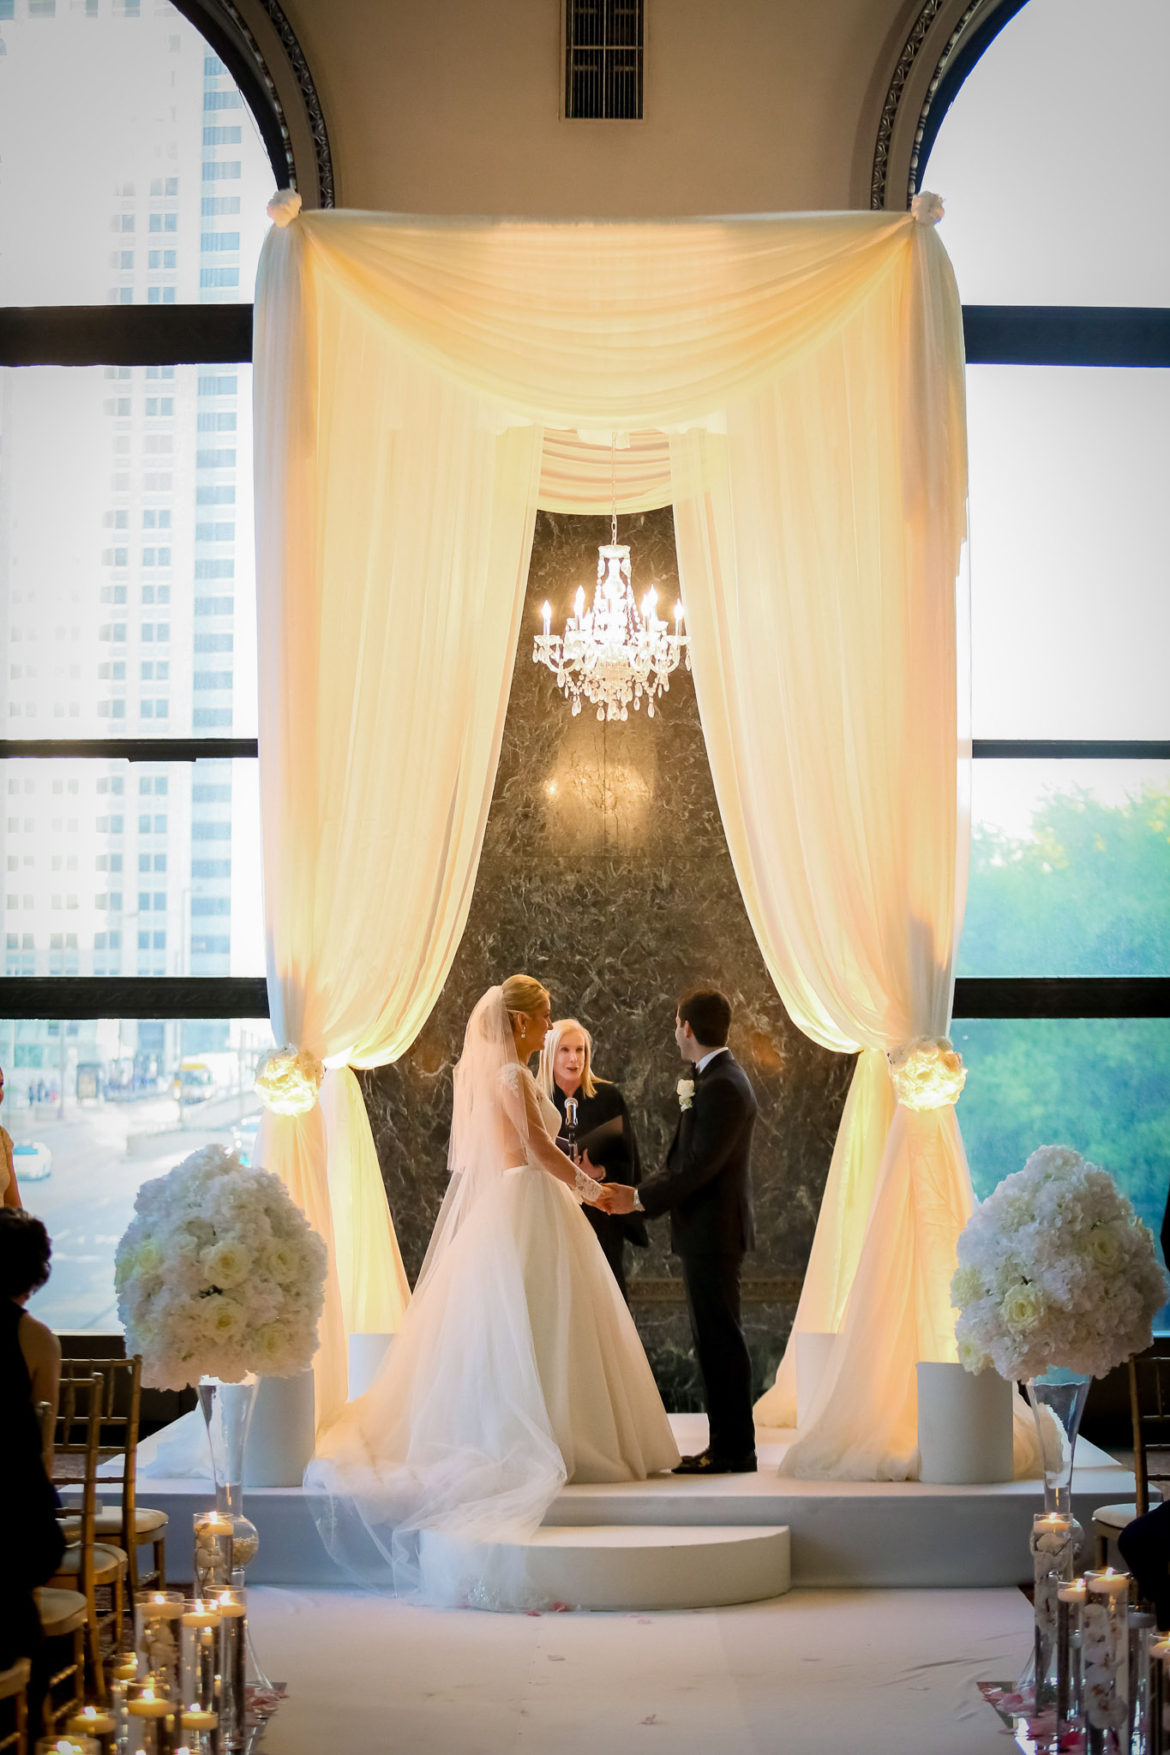 Elegant_Event_Lighting_Chicago_Cultural_Center_GAR_Hall_Wedding_Ceremony_Ivory_Bridal_Canopy_Chuppah_Crystal_Chandelier_Stage_Cover_Aisle_Runner_Elegant